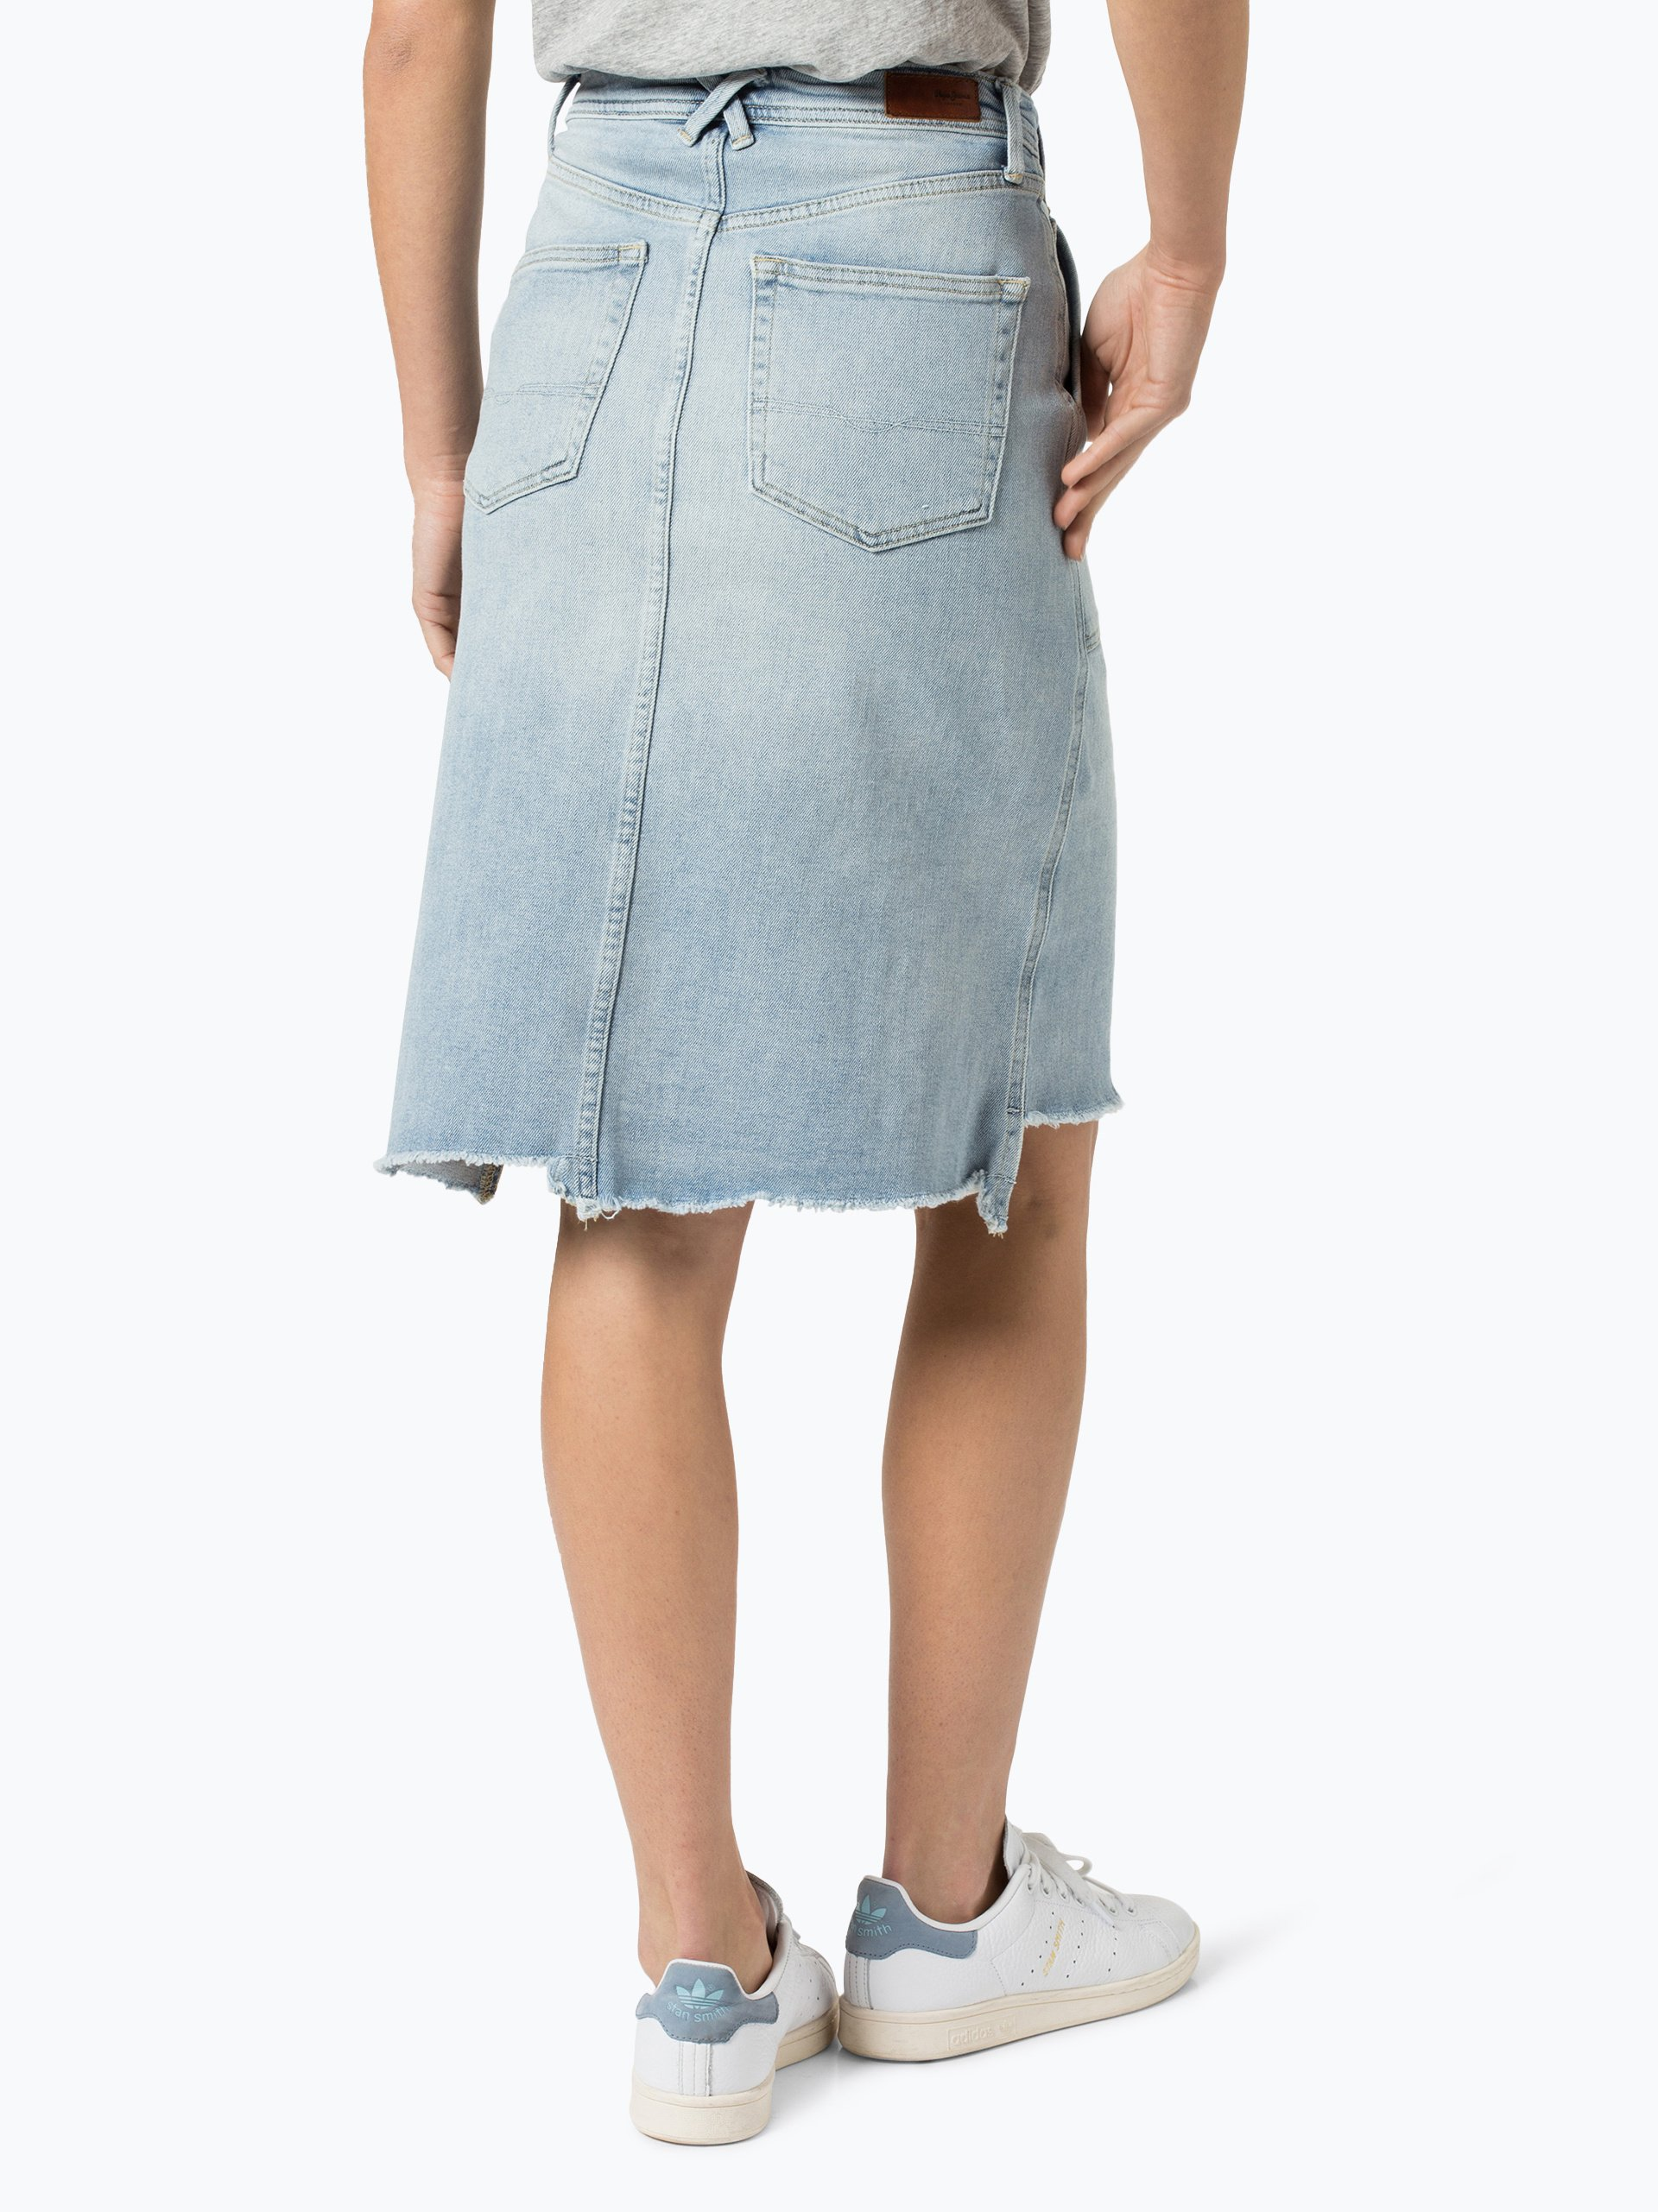 pepe jeans damen jeansrock 2 online kaufen peek und cloppenburg de. Black Bedroom Furniture Sets. Home Design Ideas